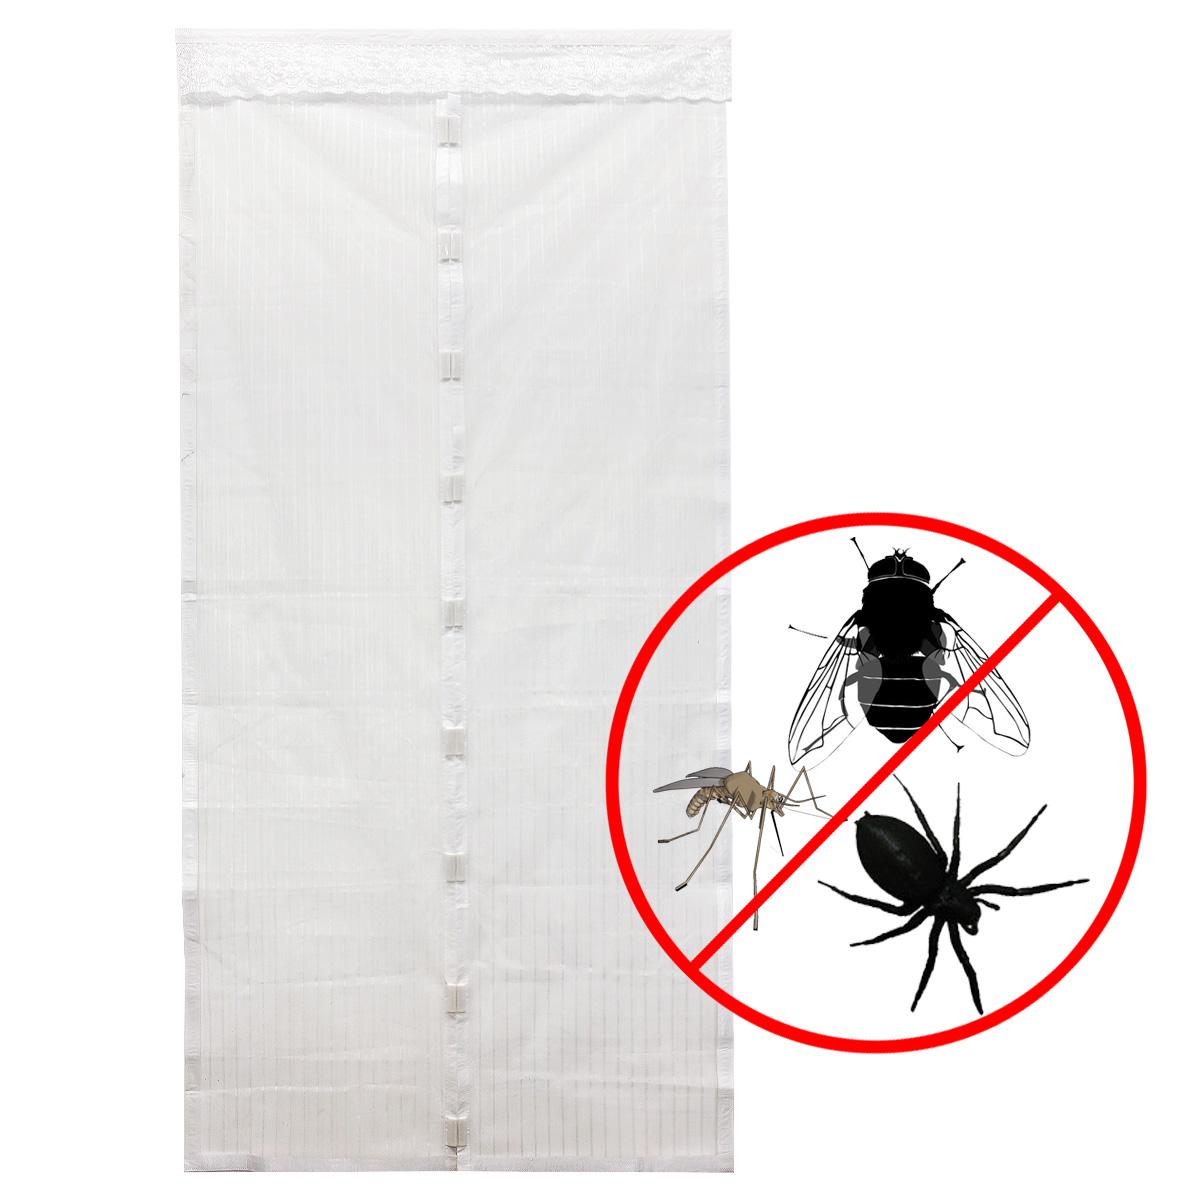 weiss magnet moskitonetz gitter magnetverschlu insektenschutz fliegennetz 210cm ebay. Black Bedroom Furniture Sets. Home Design Ideas